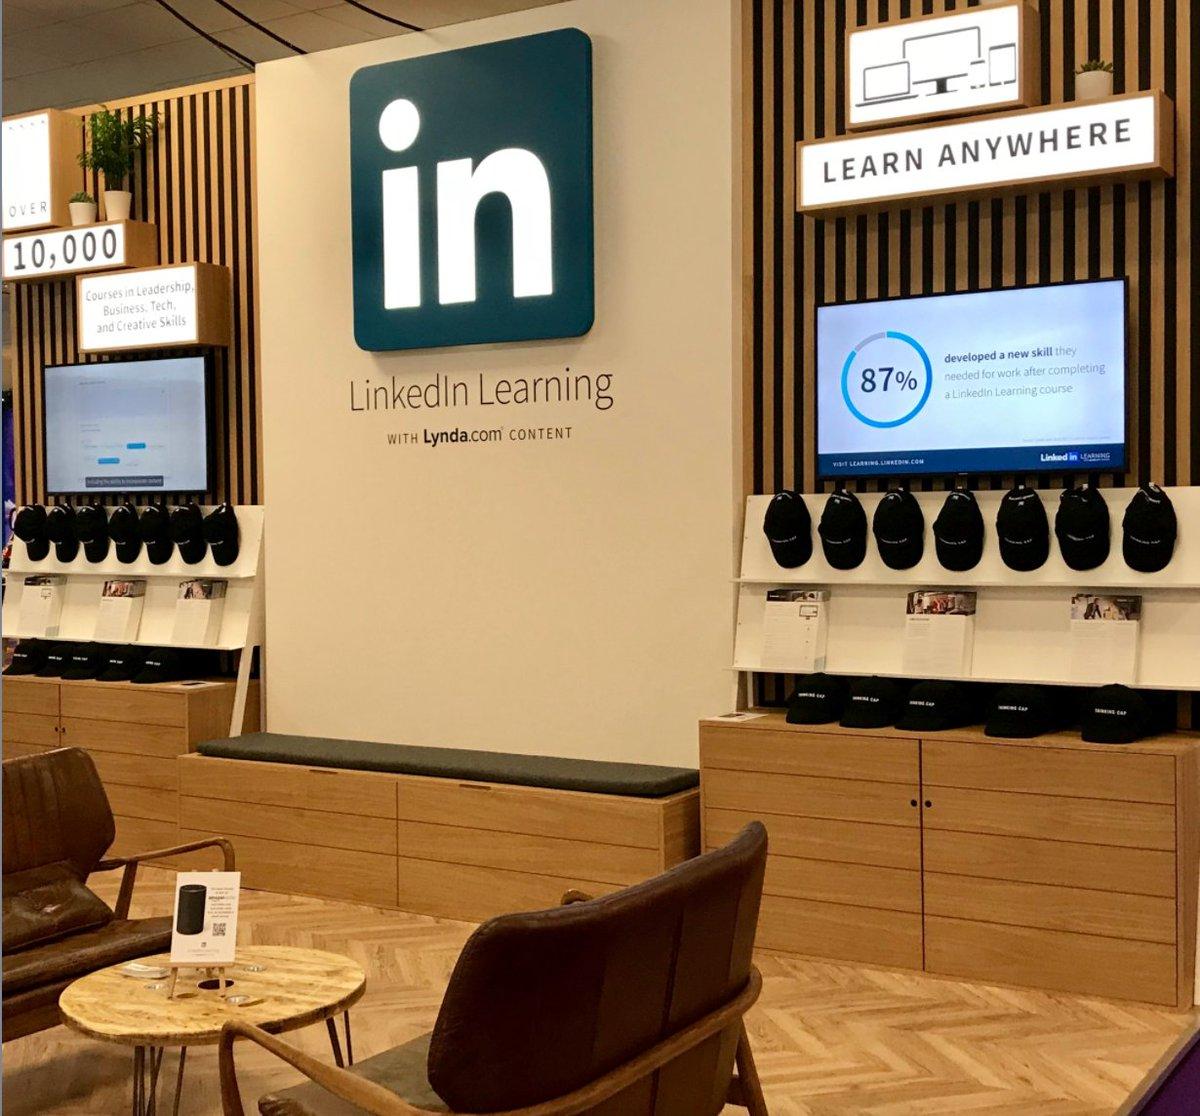 LinkedIn Learning on Twitter: